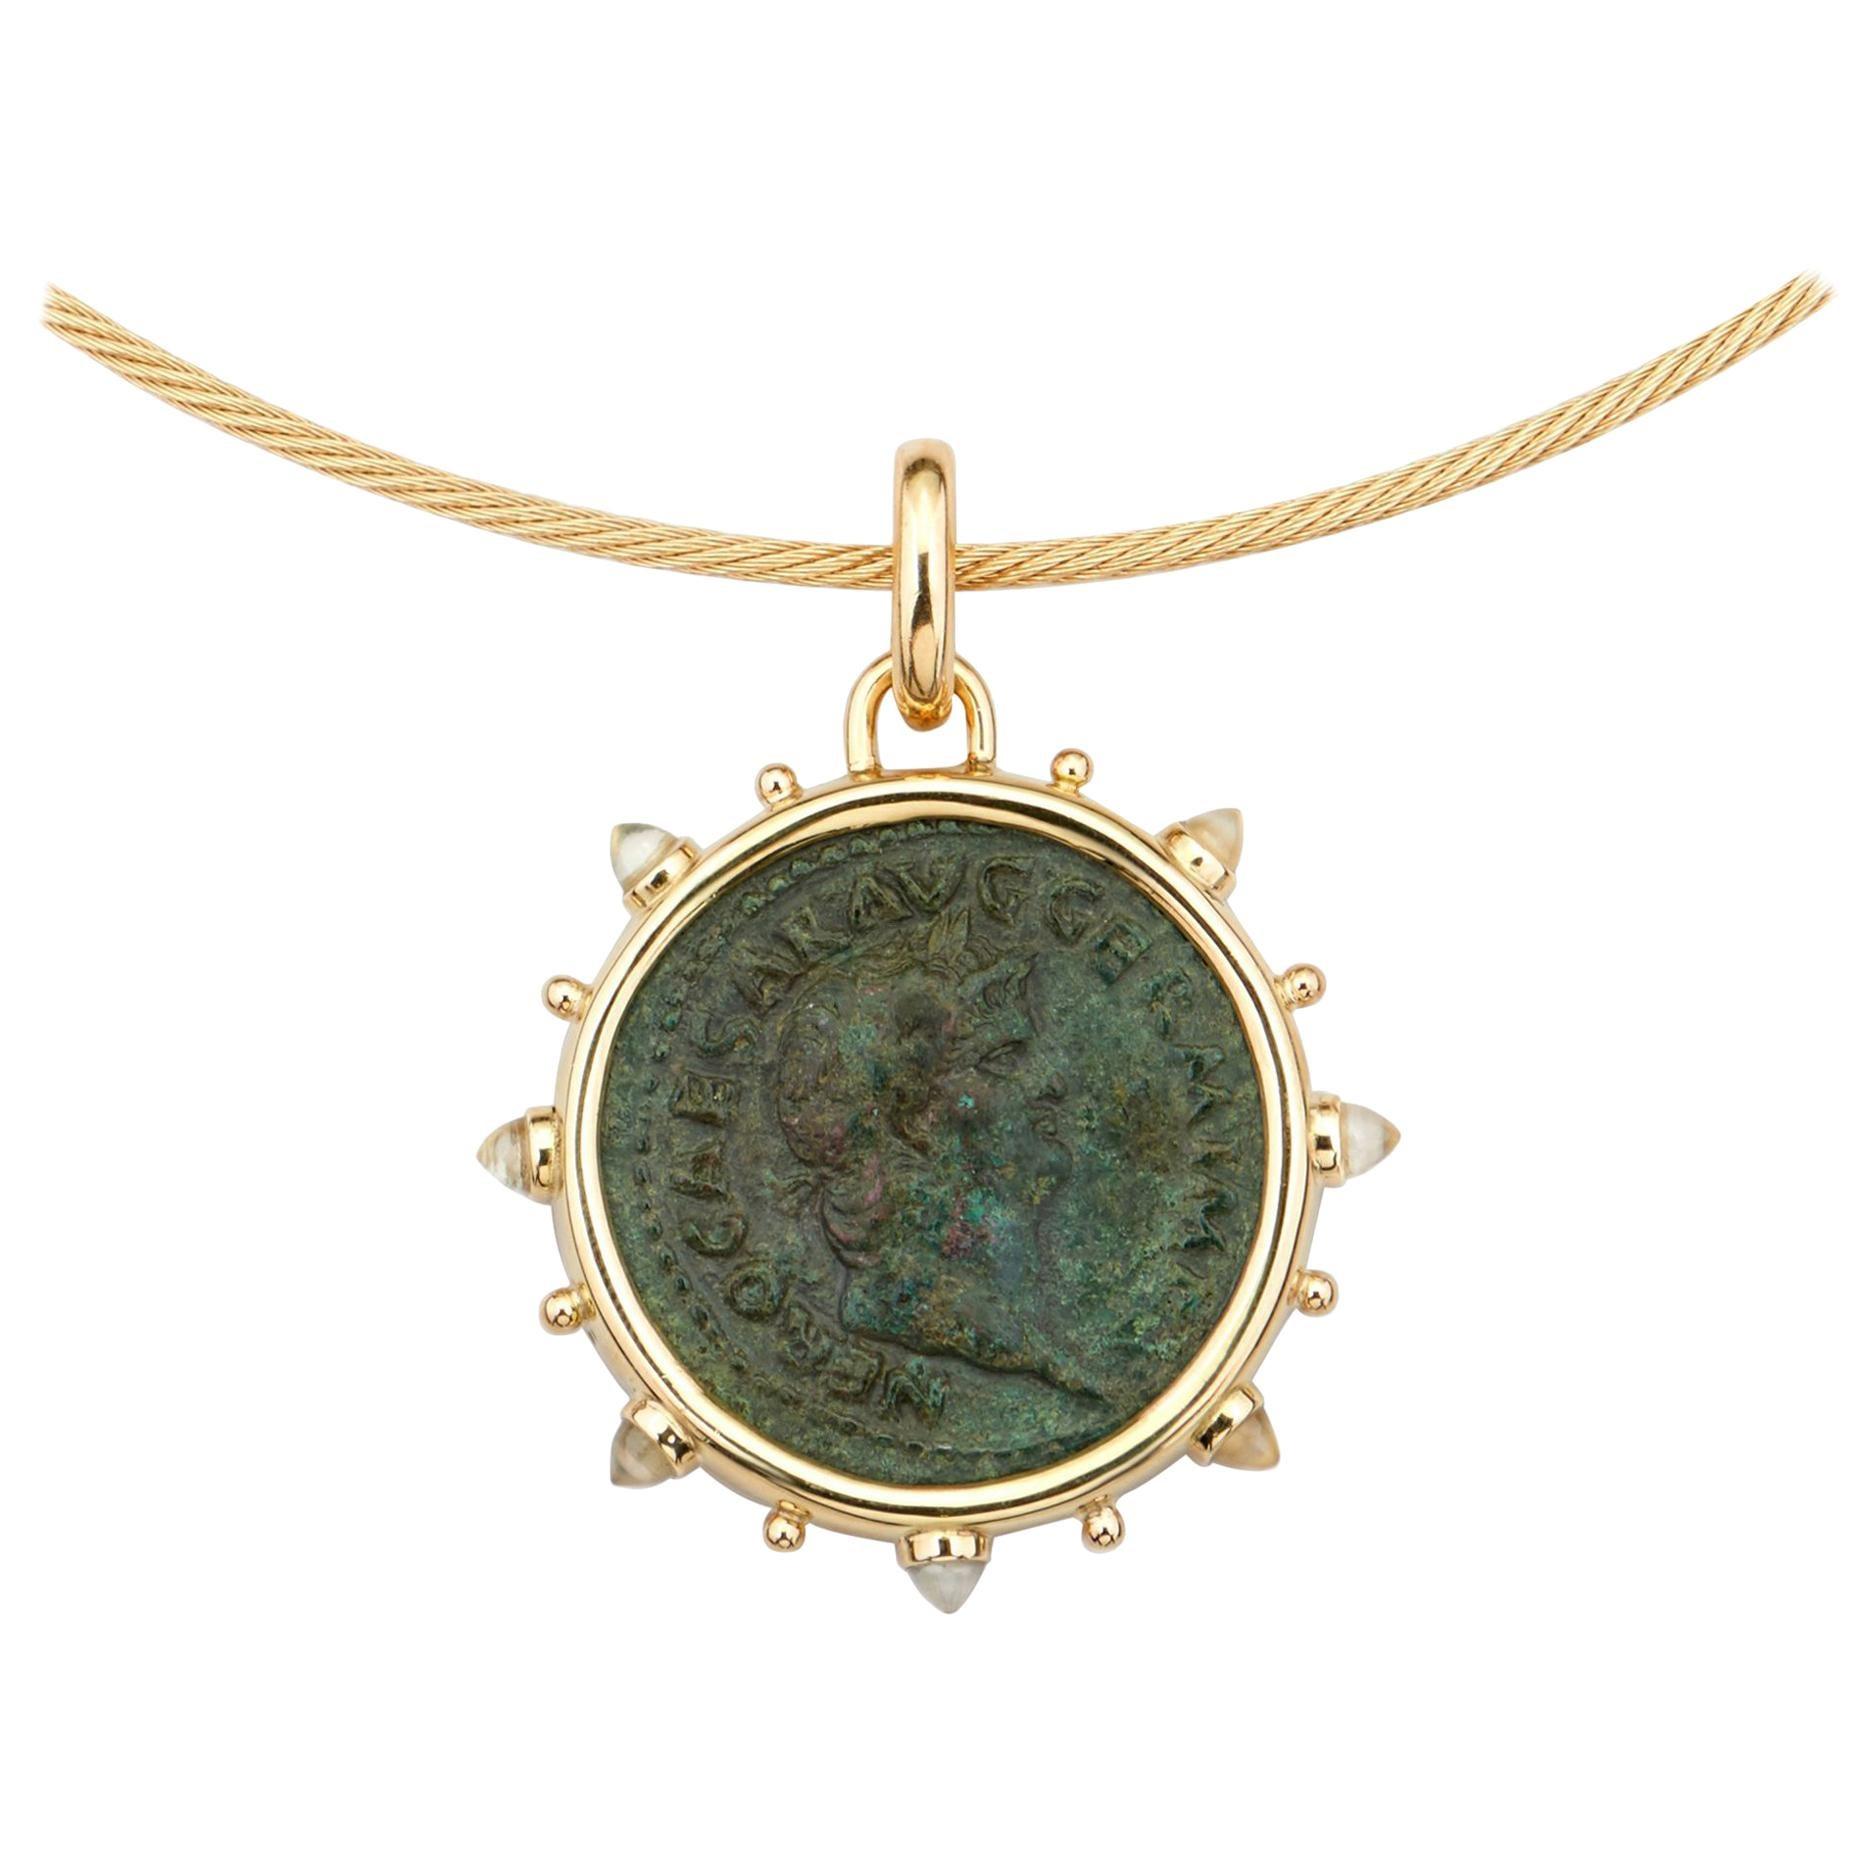 Dubini Ancient Roman Nero Bronze Coin 18 Karat Yellow Gold Moonstone Necklace